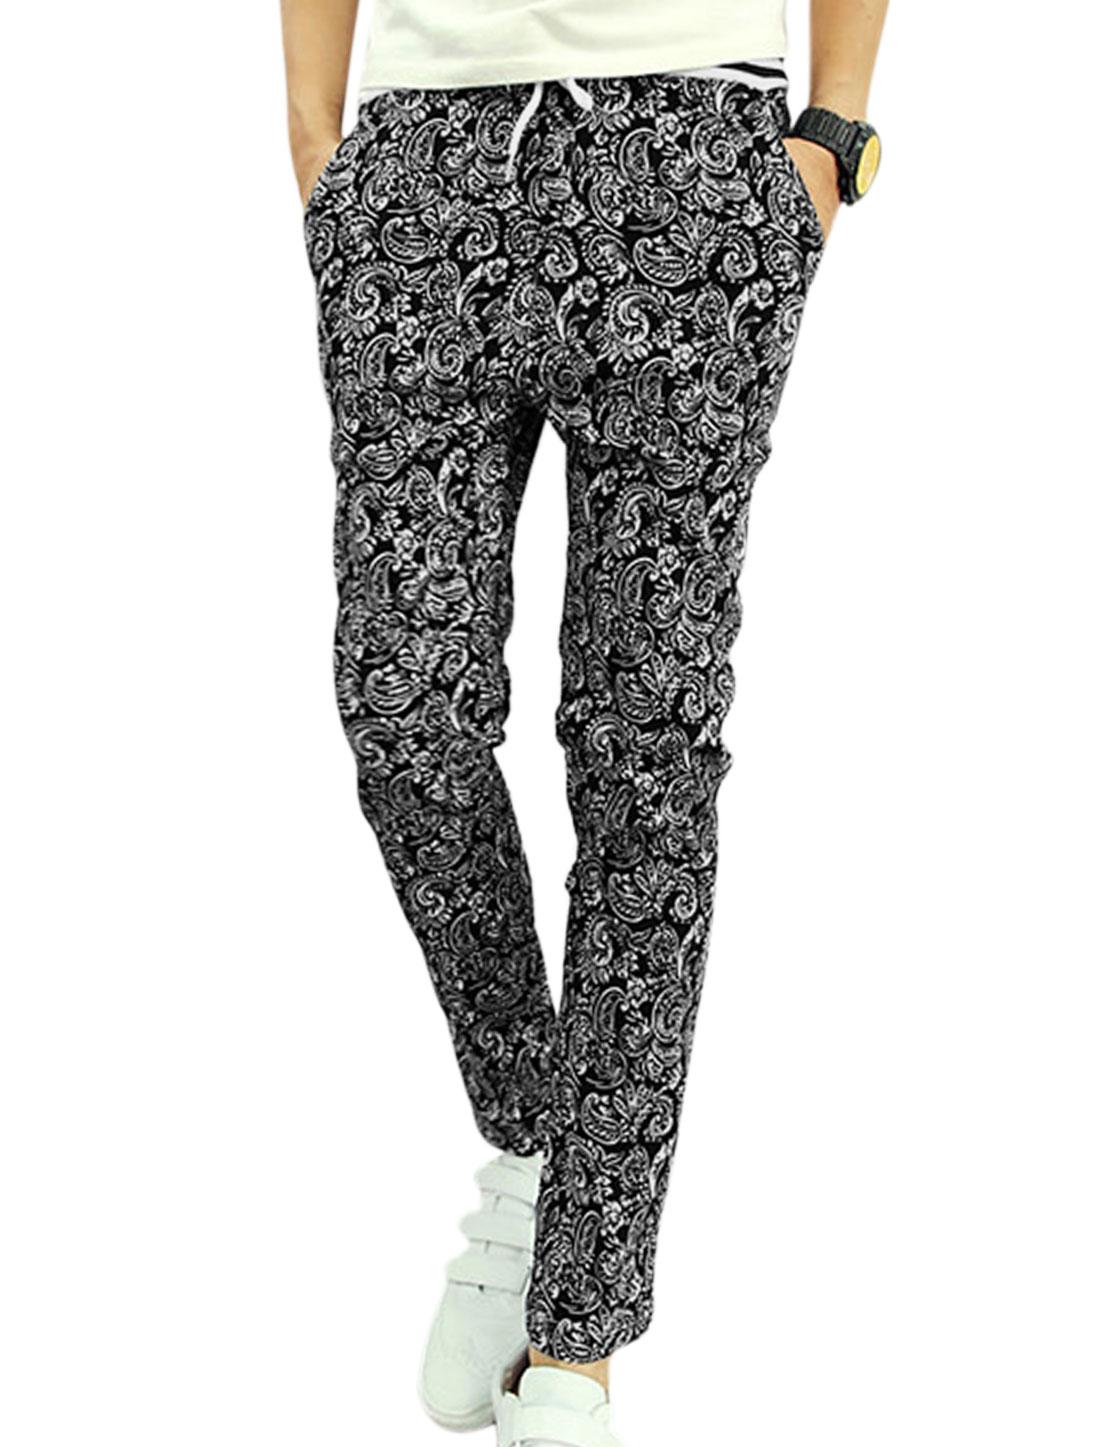 Men Elastic Waist Floral Prints Detail Paisleys Skinny Trousers Black W28